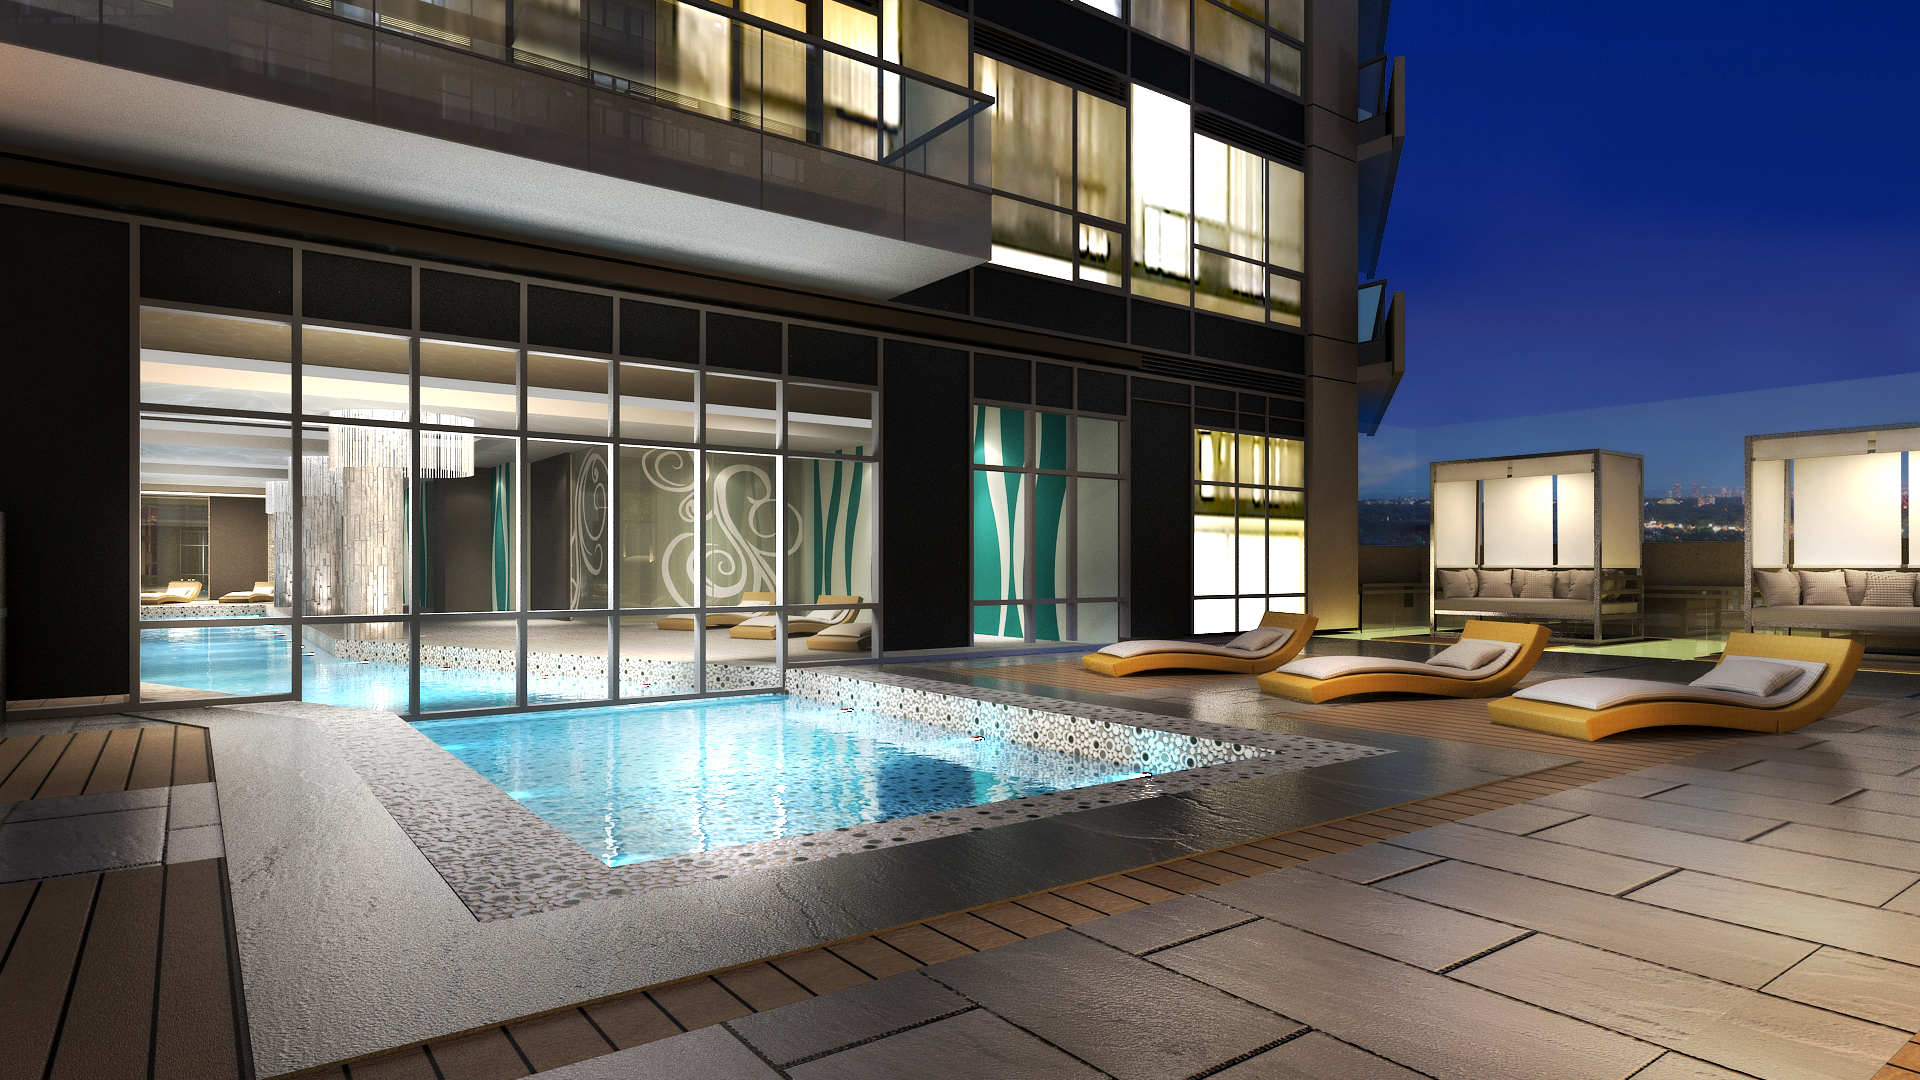 The beverly hills resort landscape design richmond for Courtyard designs bathurst